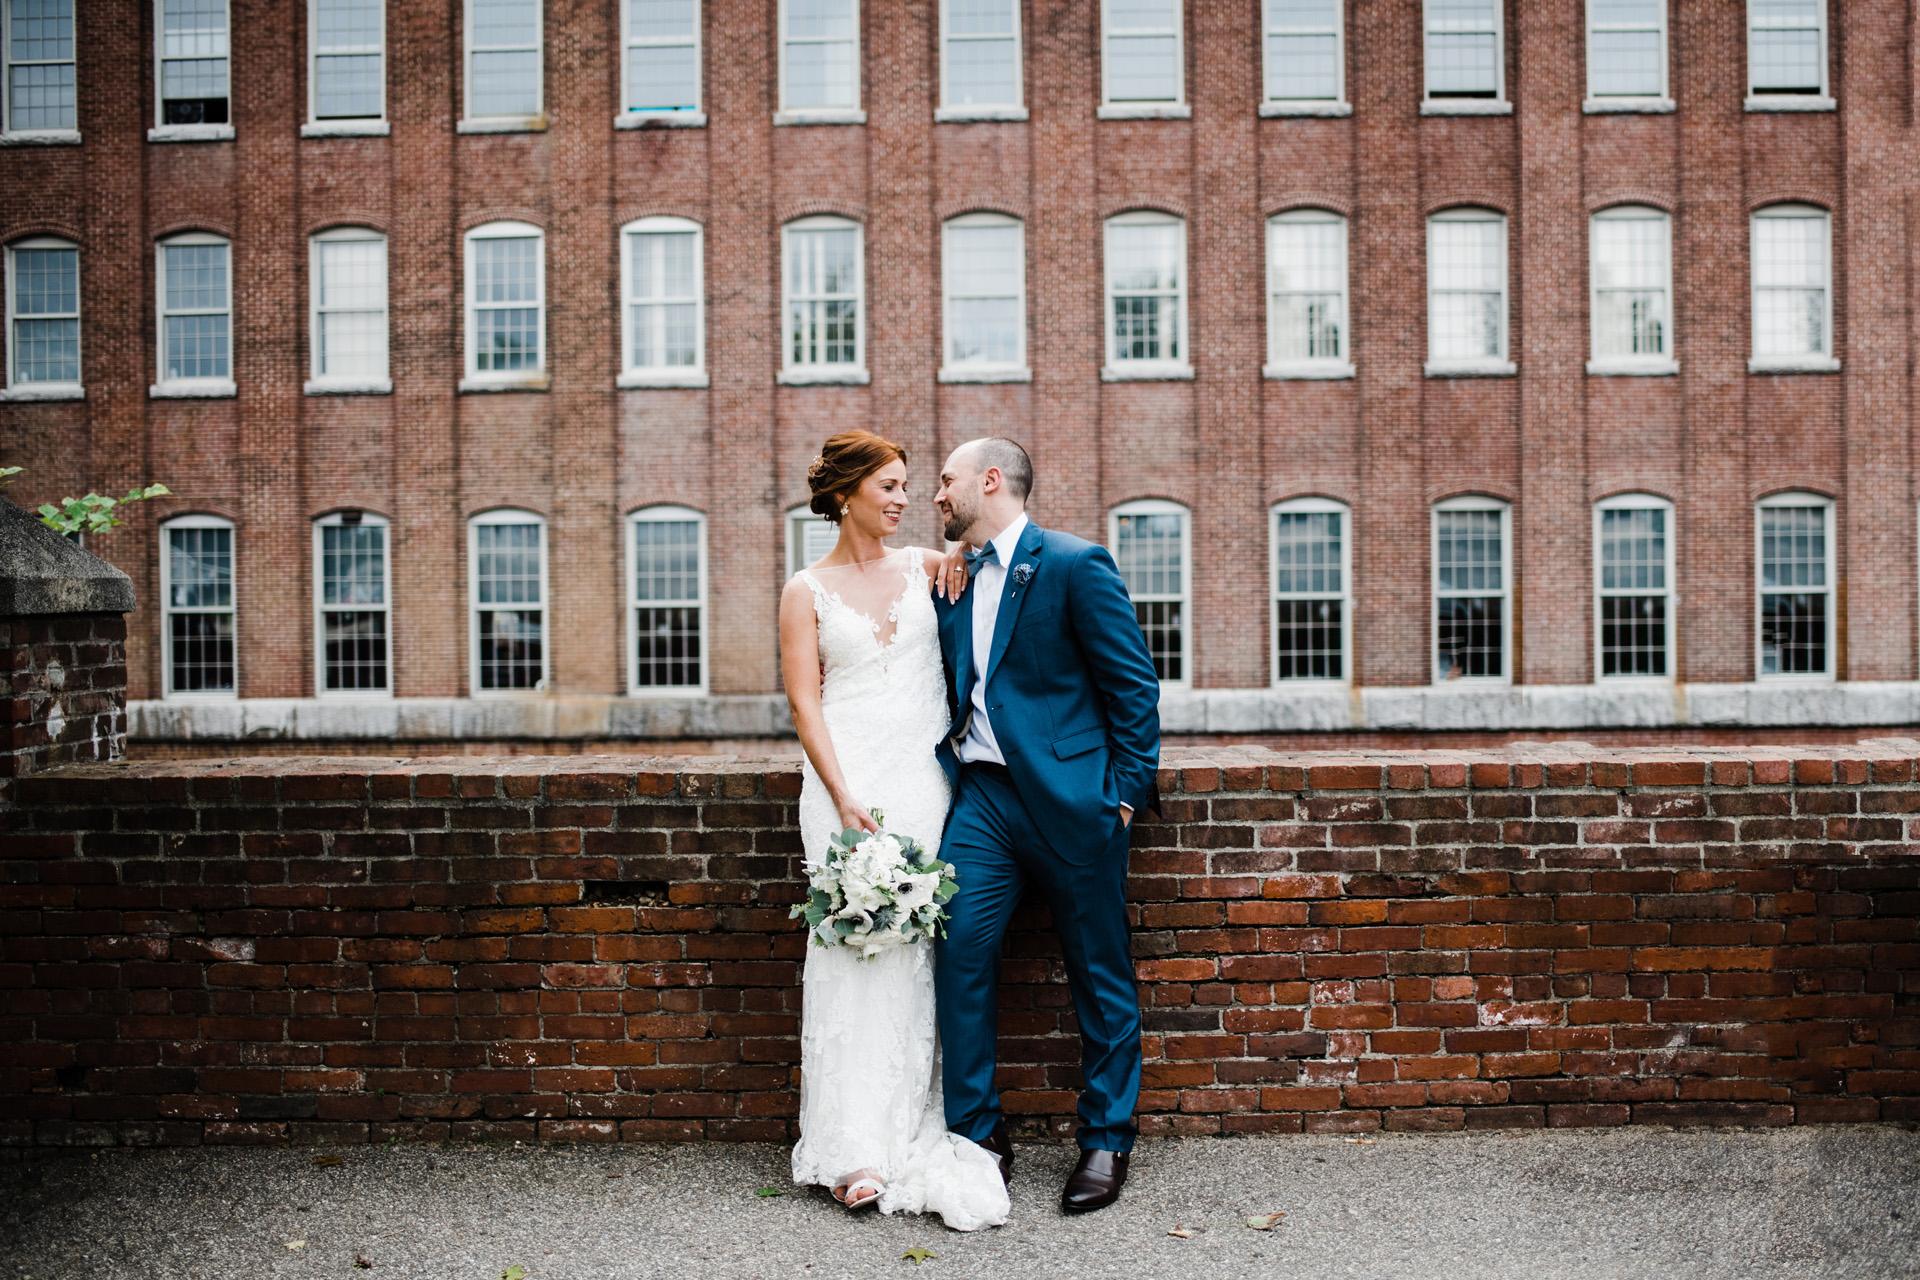 rivermill-new-hampshire-wedding-31